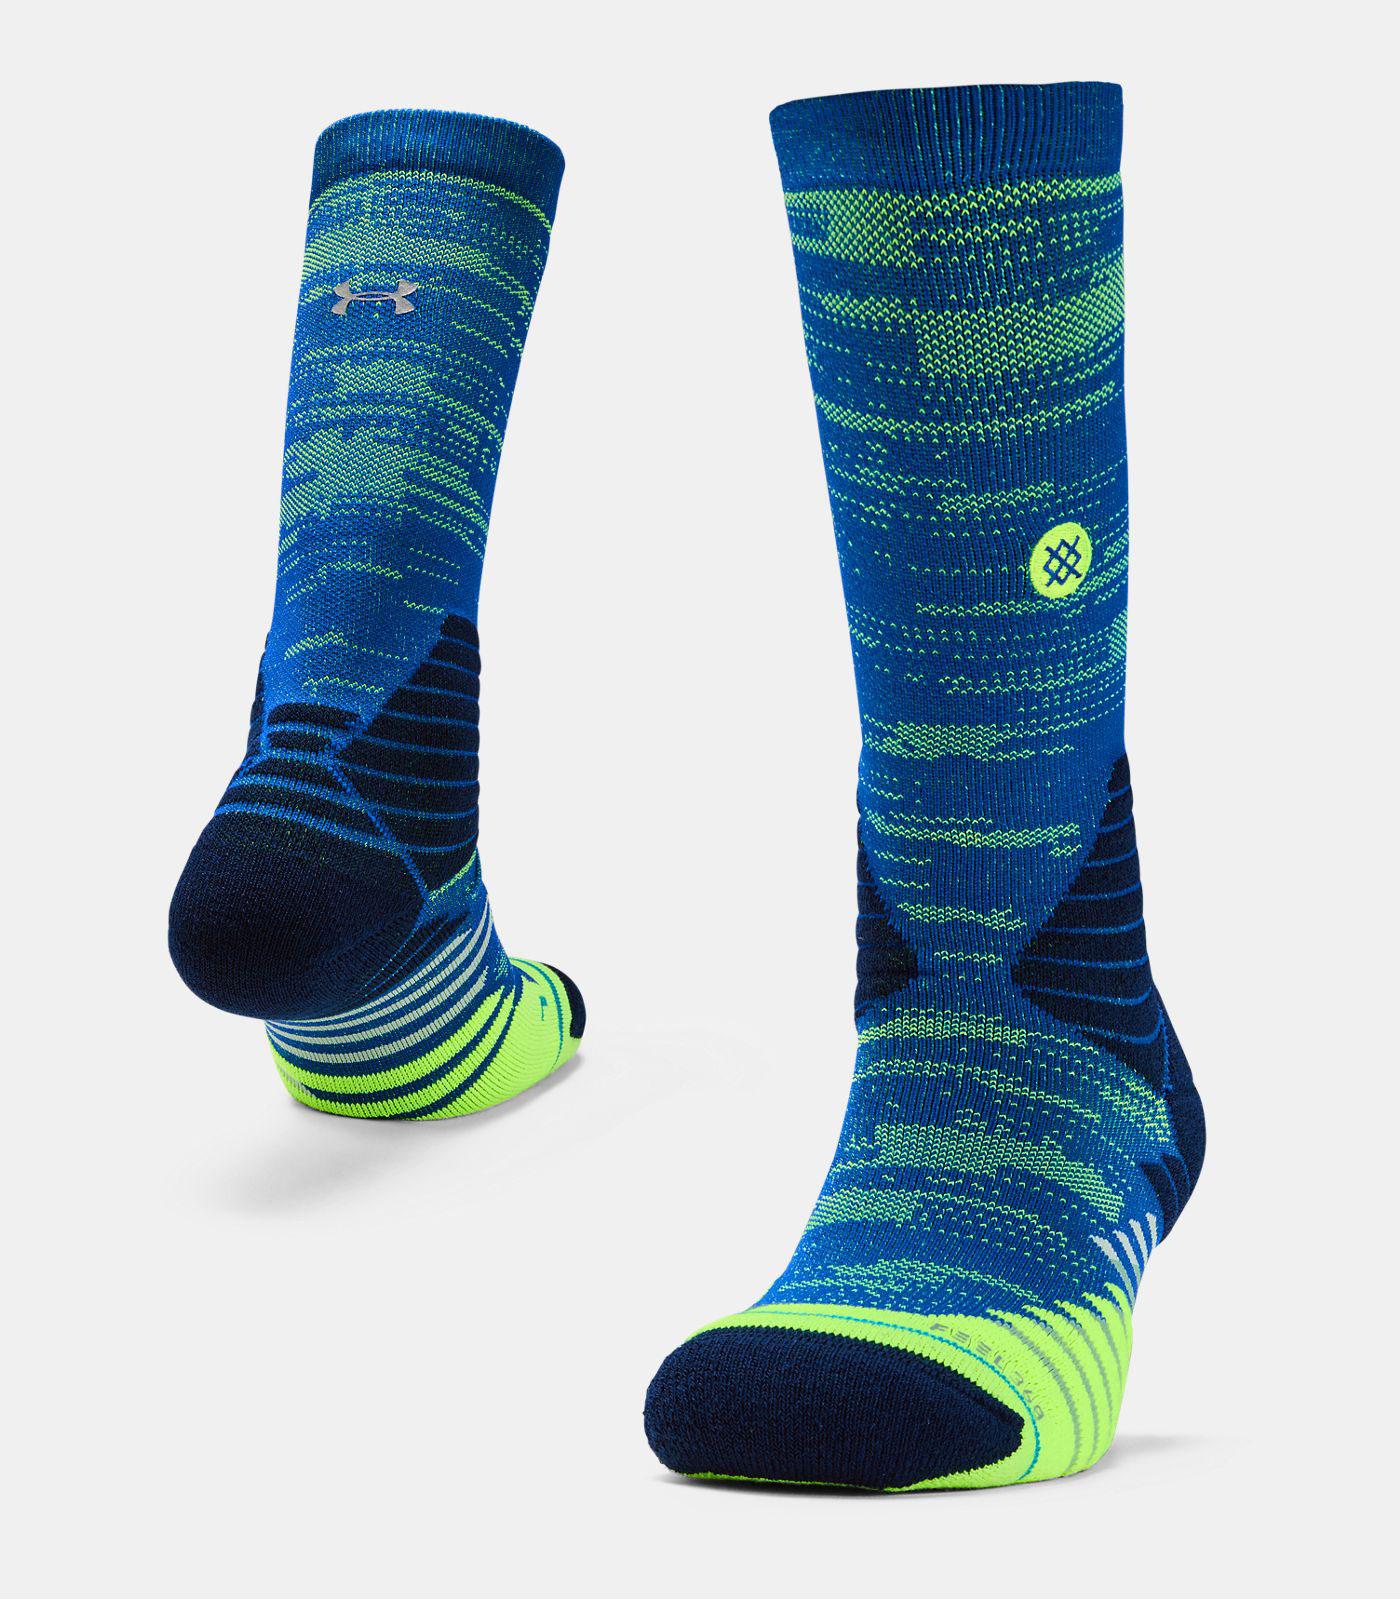 curry-7-dub-nation-socks